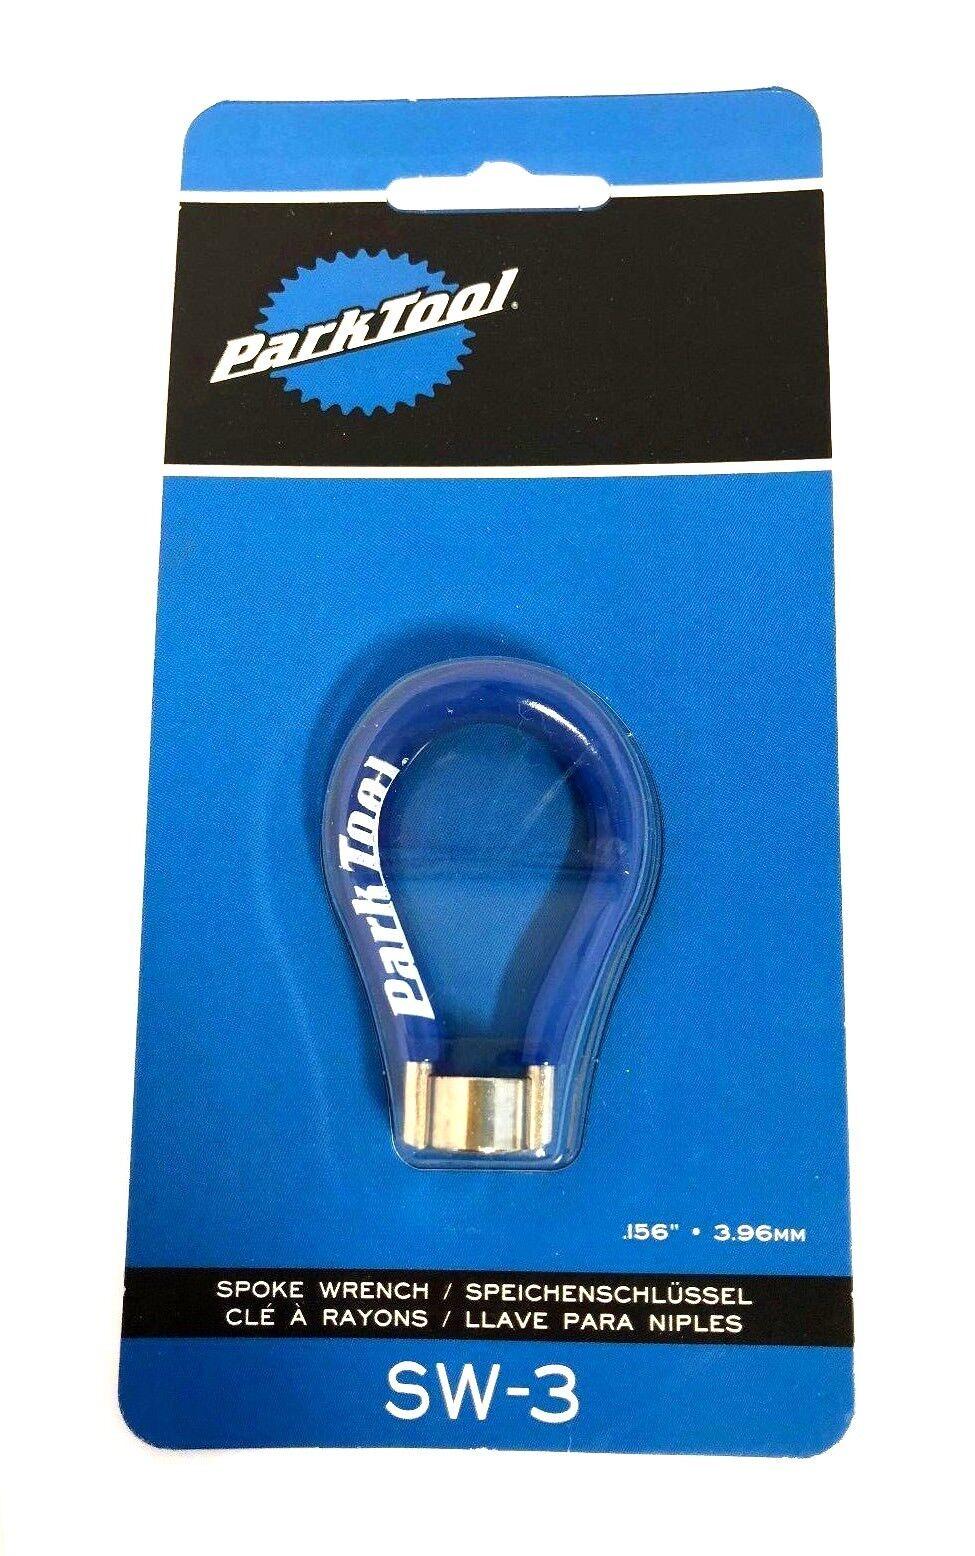 Park Tool SW-3 Spoke Wrench Wheel 3.96mm bluee Bike Repair Tool SW-3C NEW